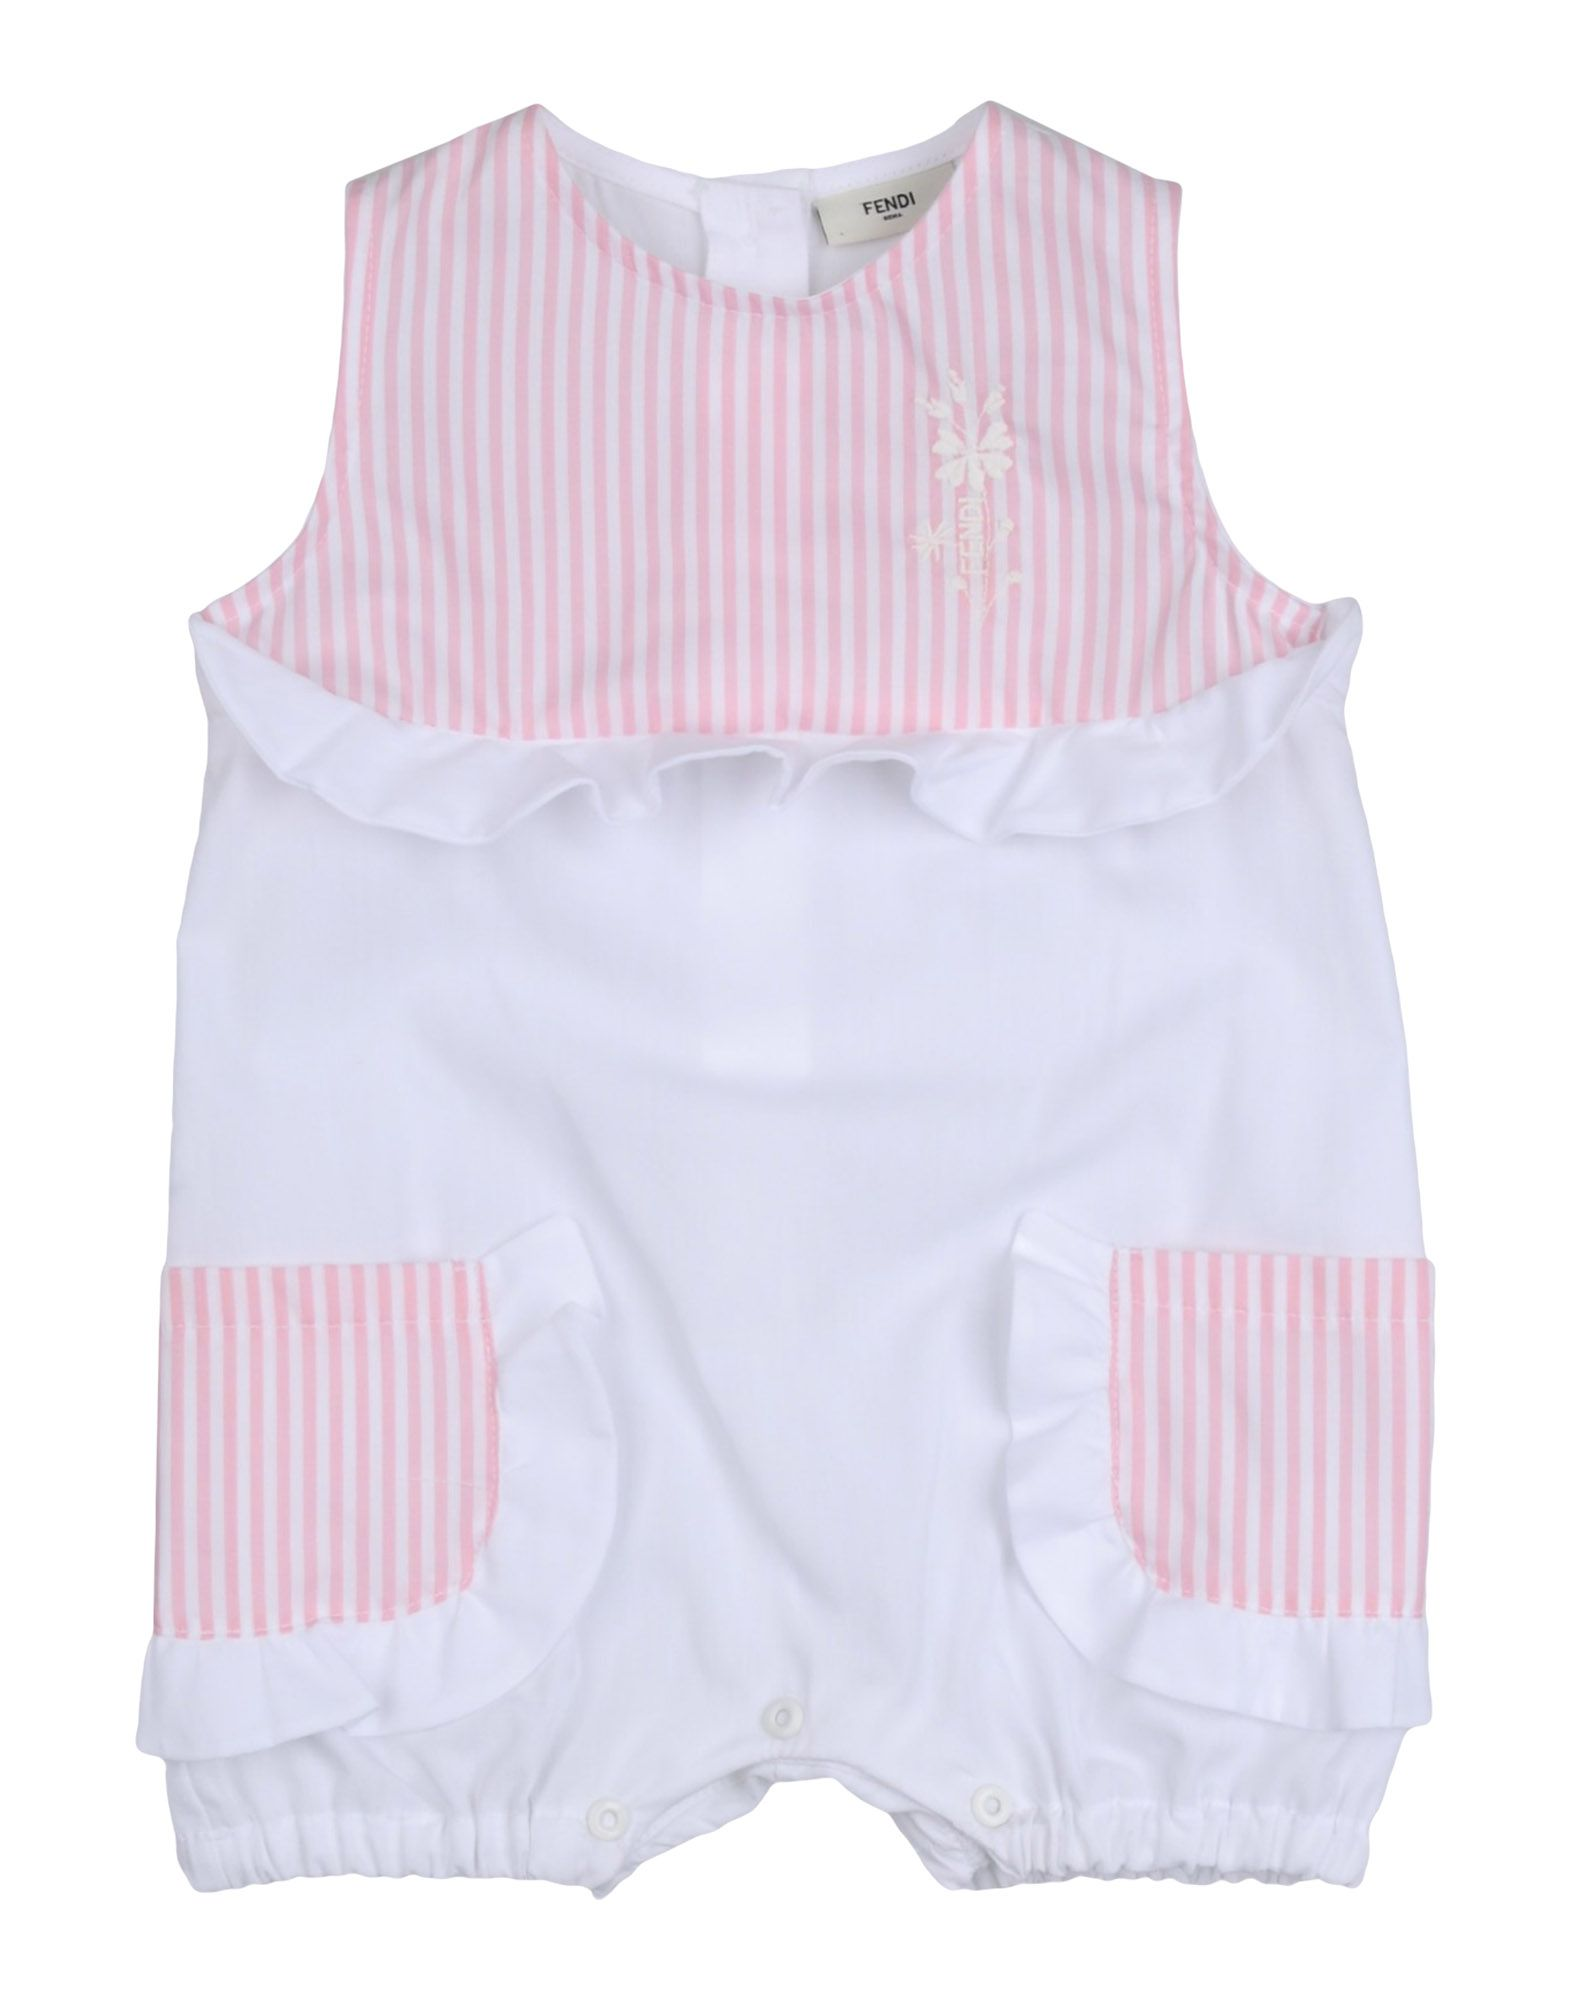 Fendi clothing for baby girl & toddler 0 24 months